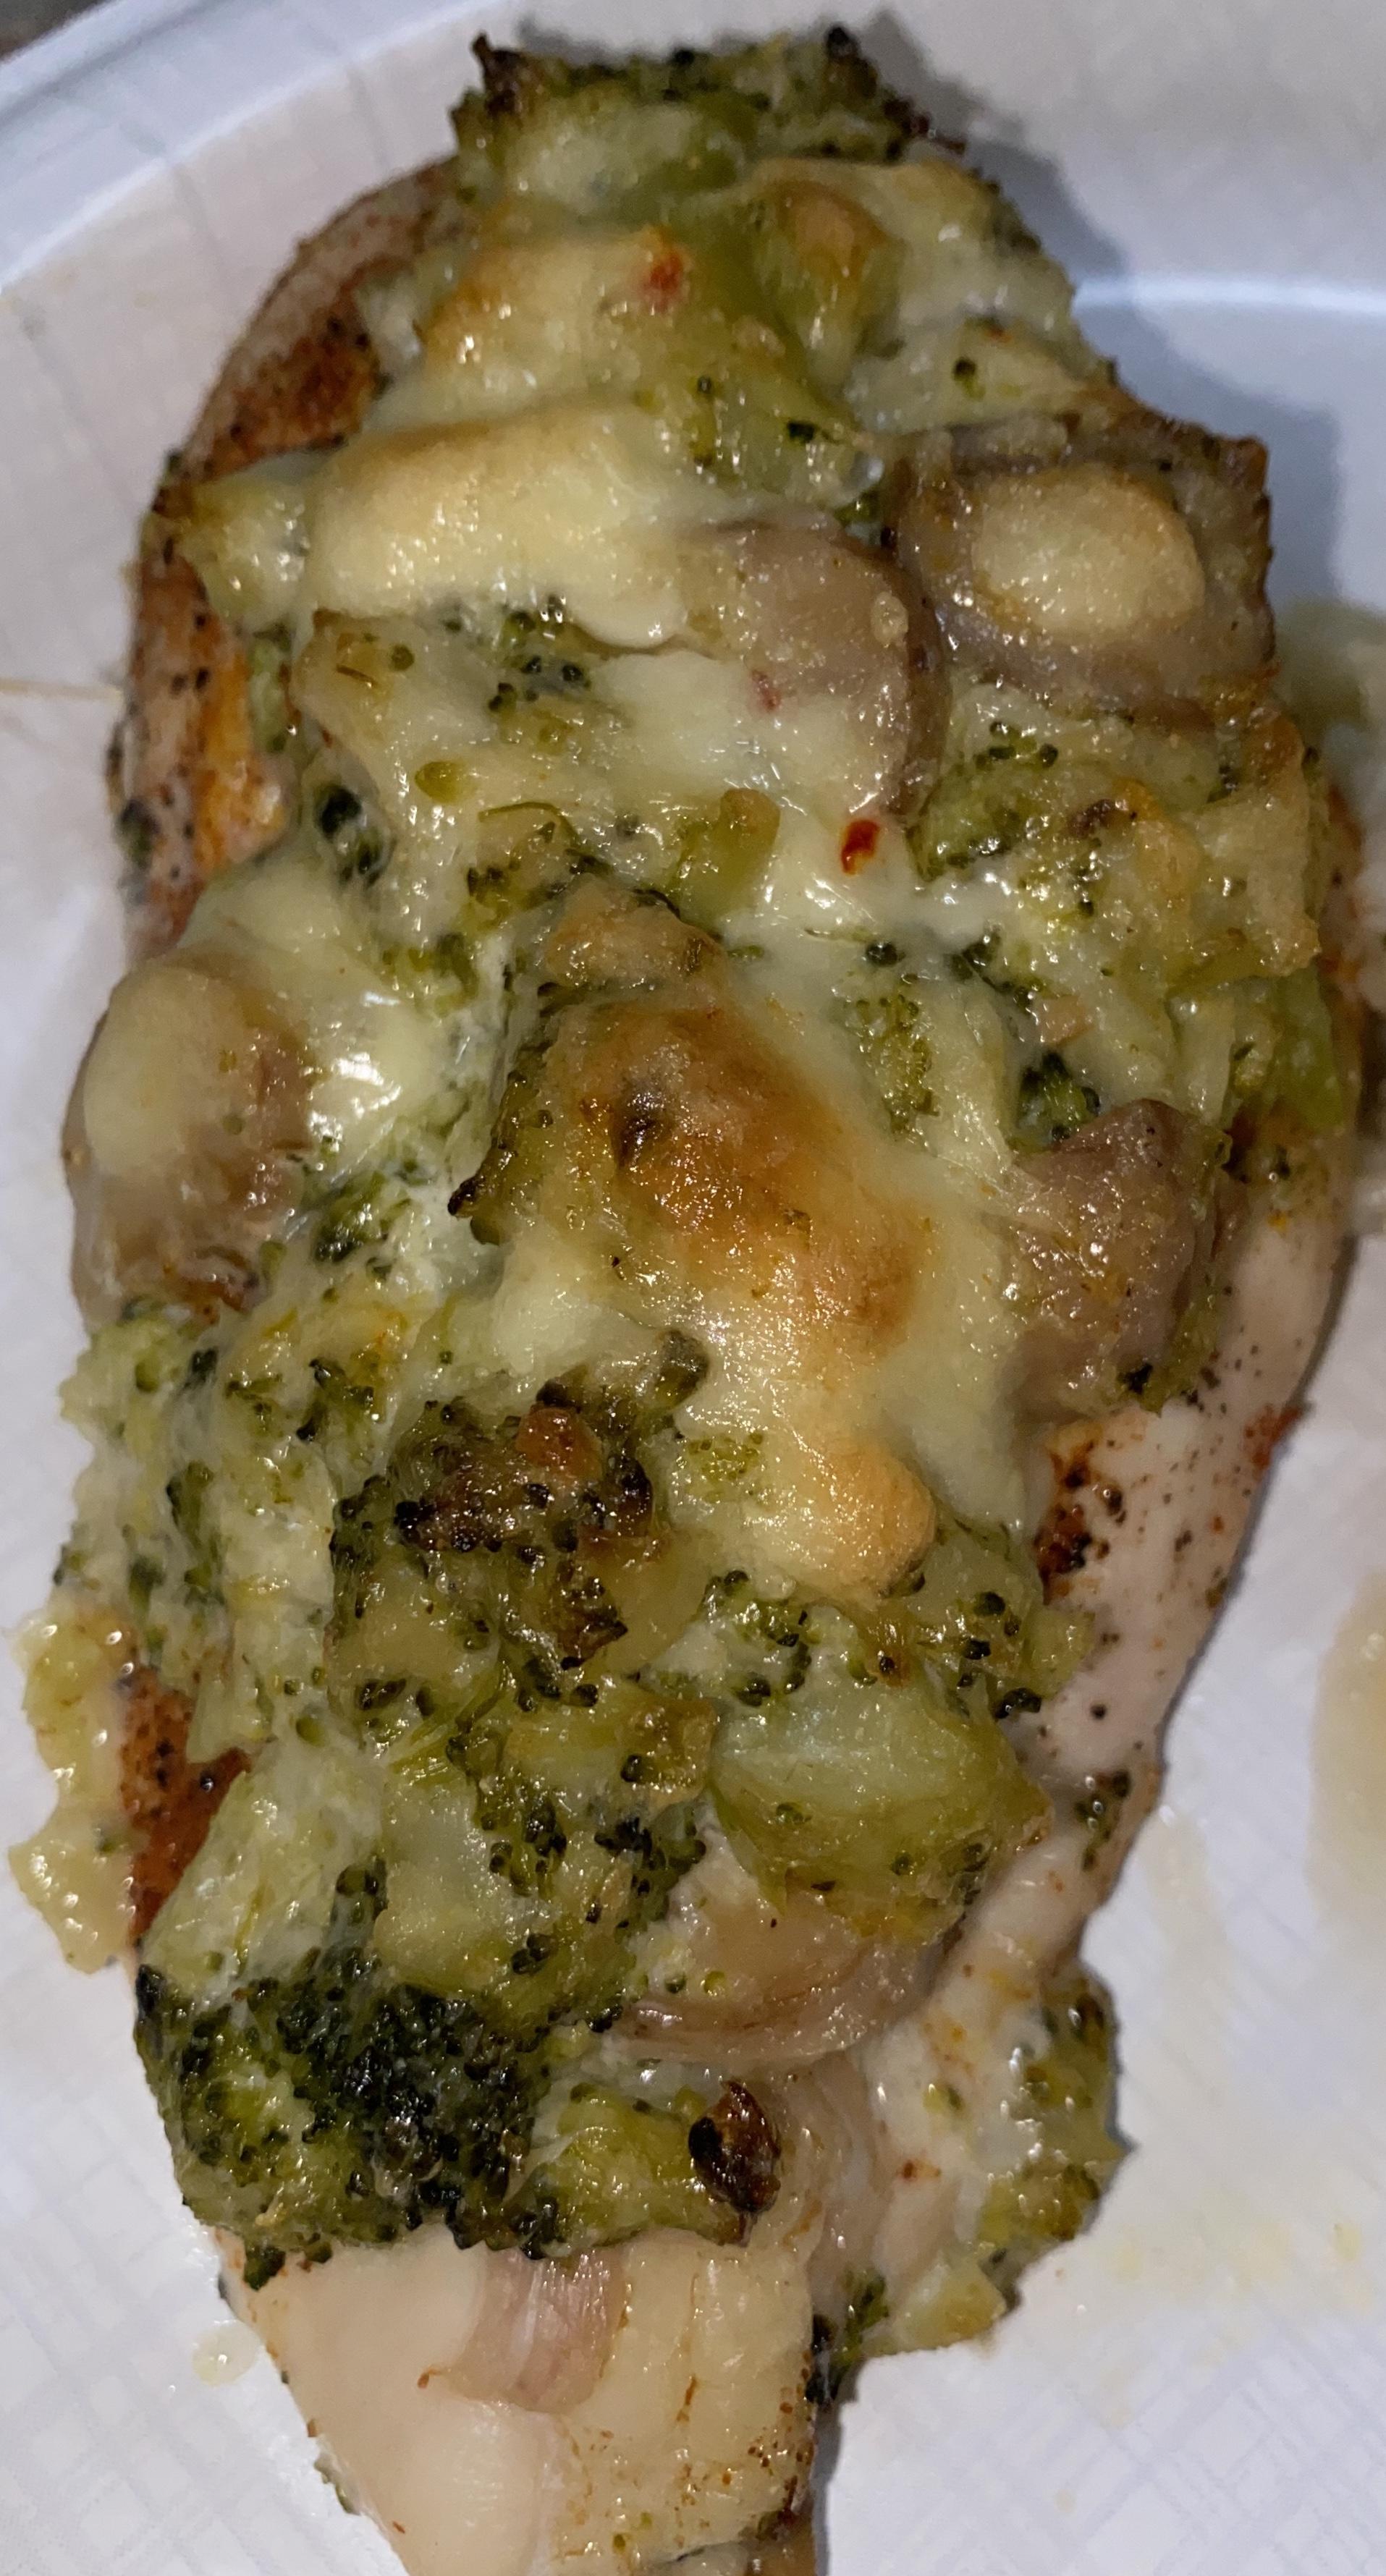 Mushroom, Broccoli, and Cheese Stuffed Chicken Felecia Ott